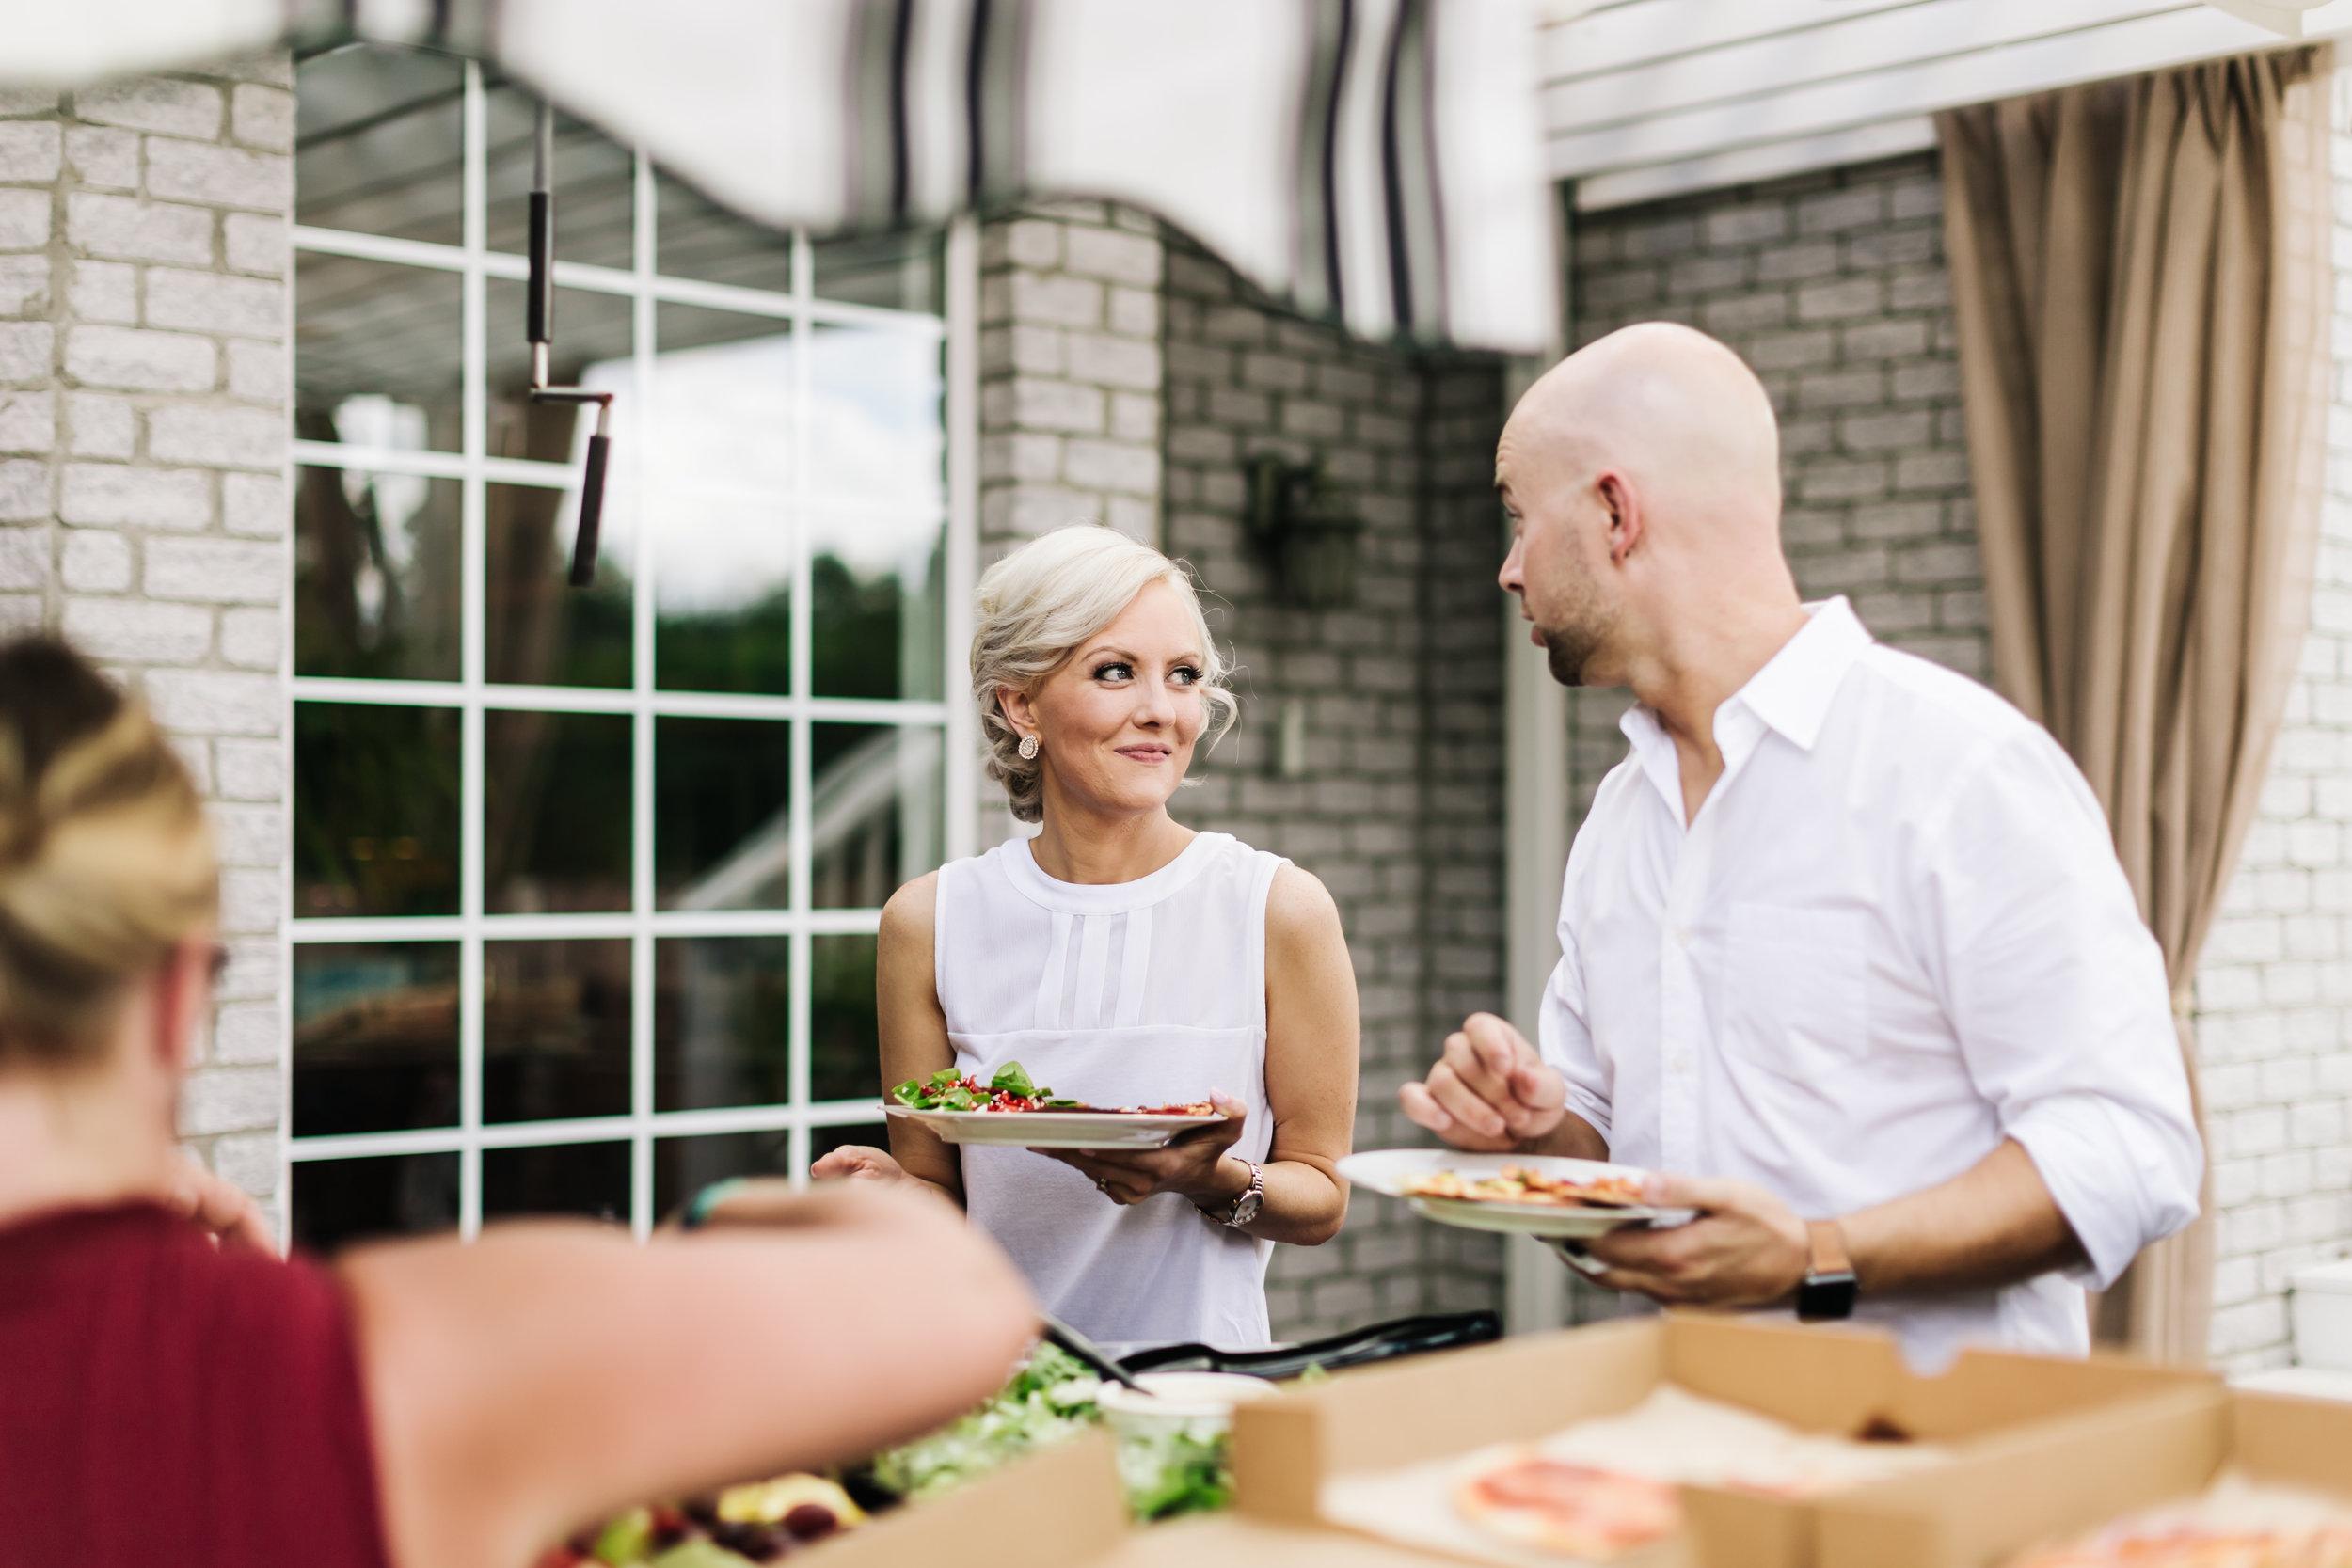 2018.09.02 Ray and Sarah Prizner Nashville TN Wedding FINALS-455.jpg